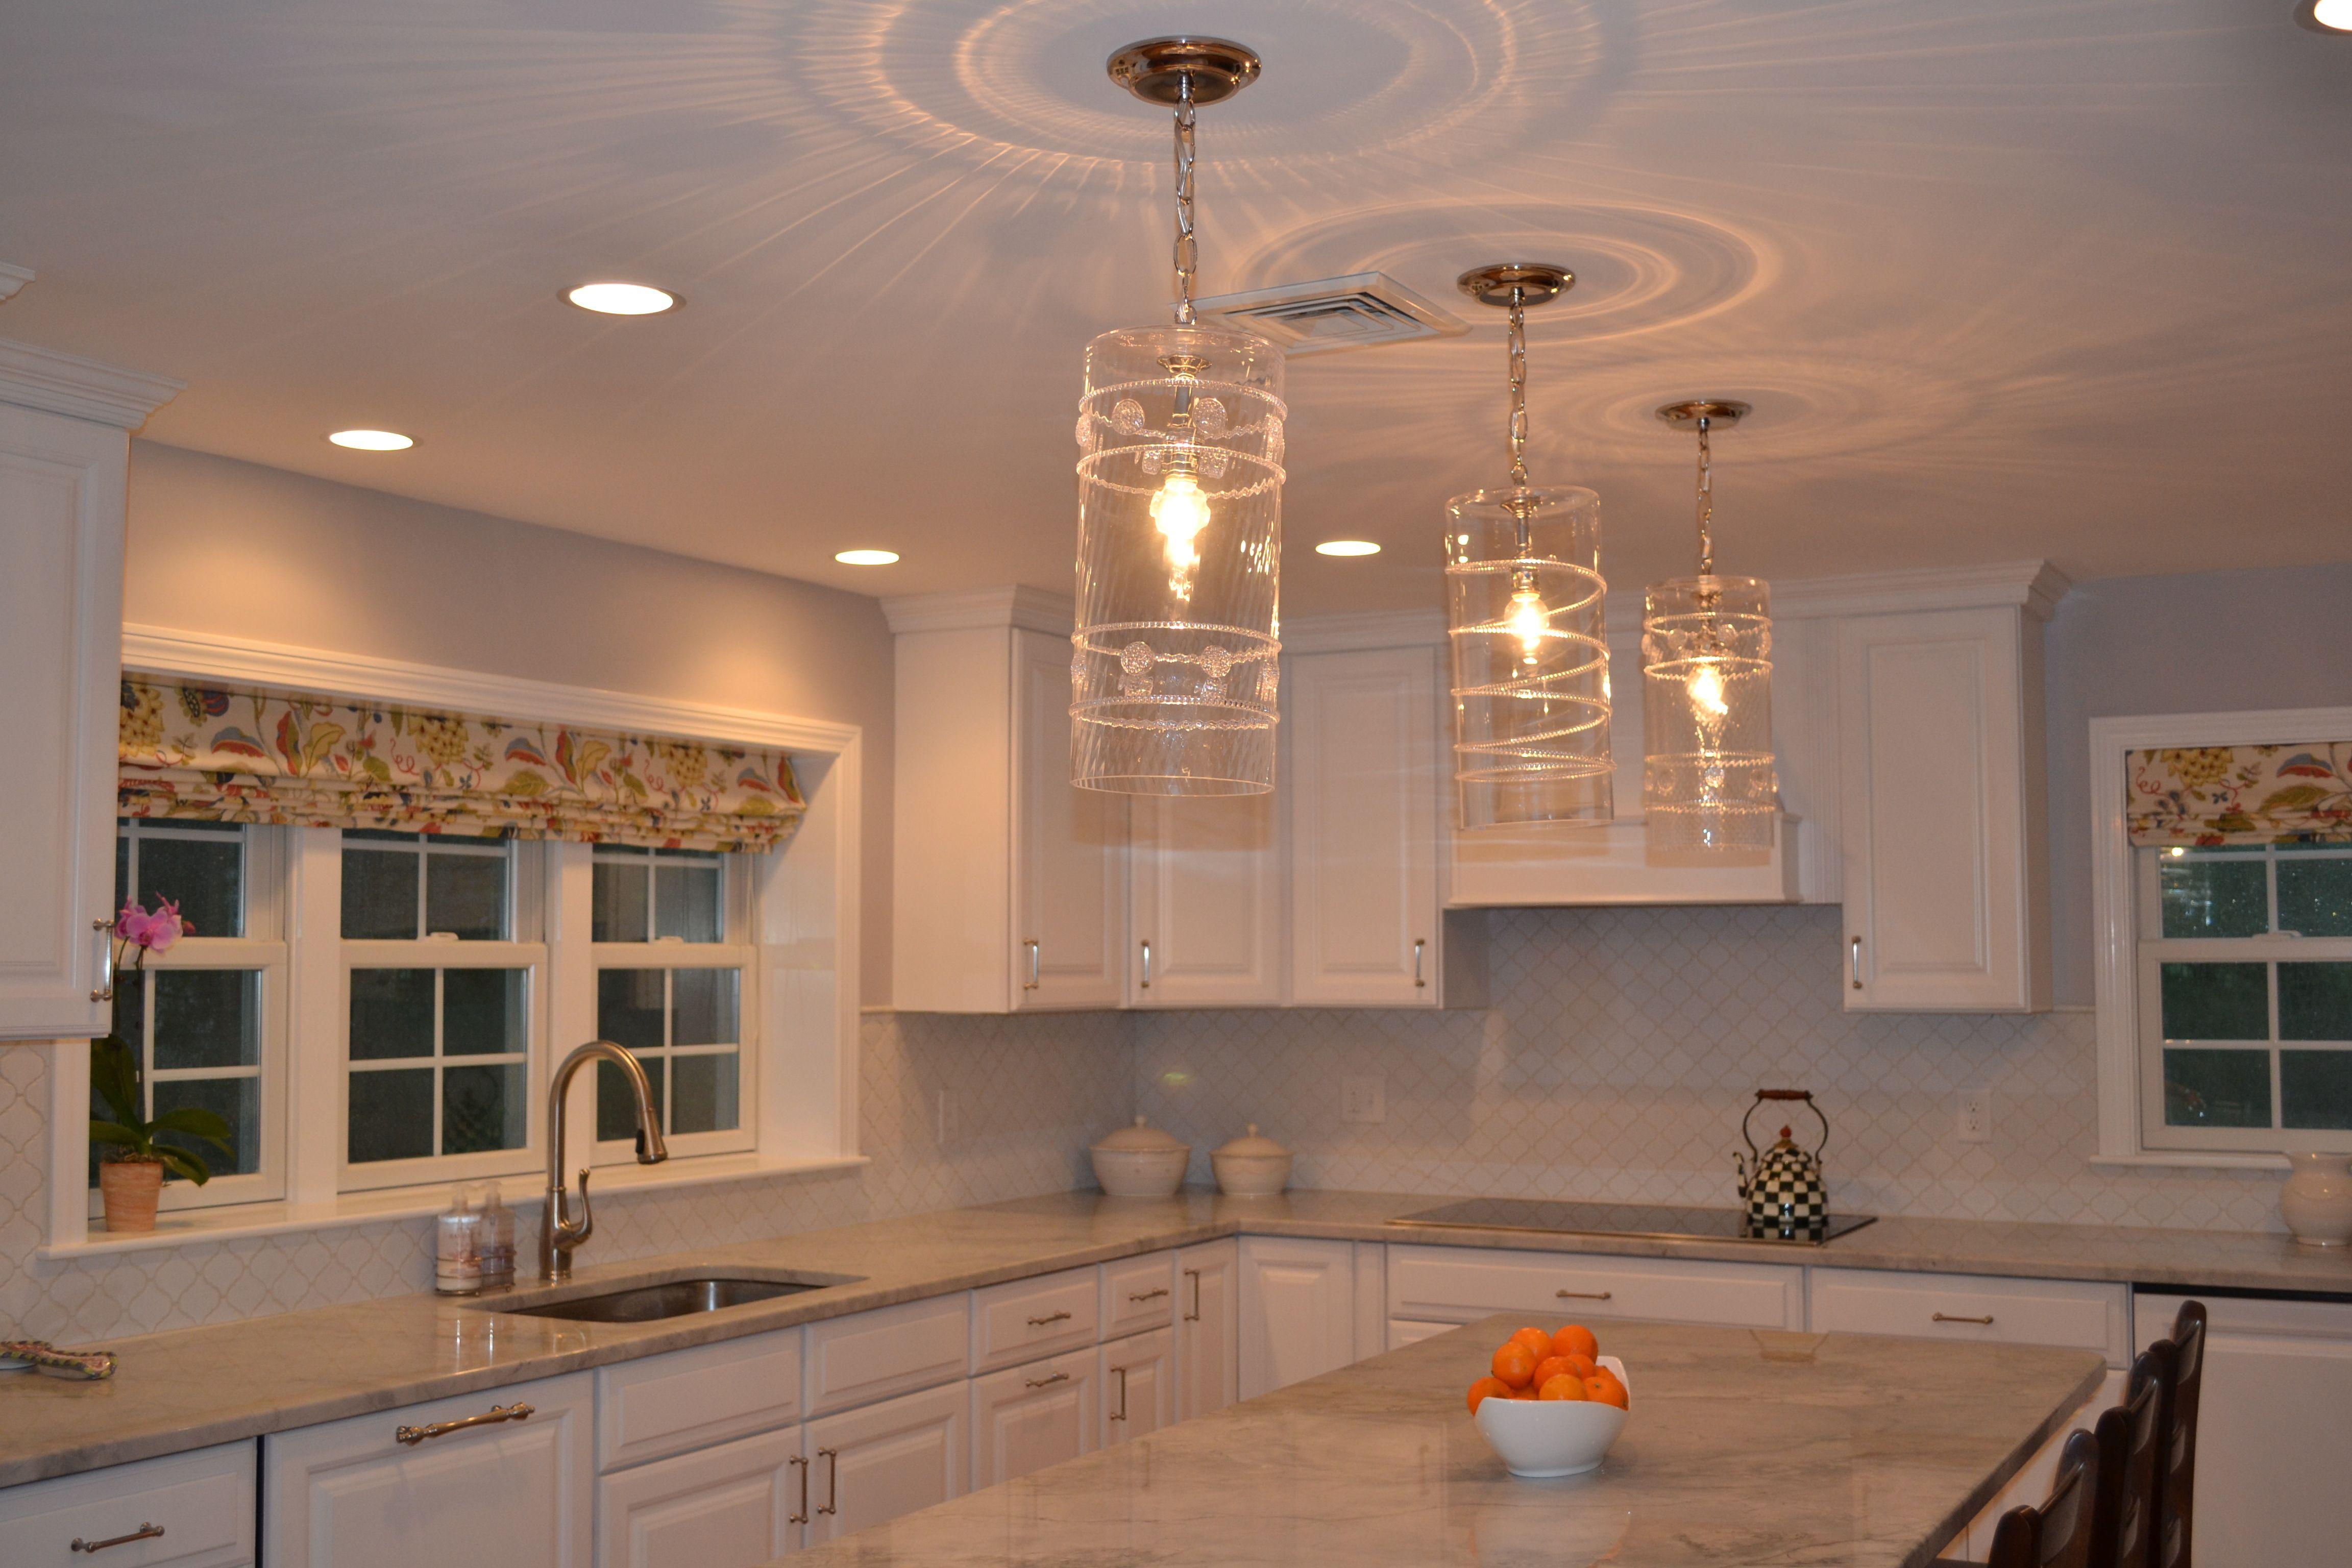 pendant light fixtures over kitchen island  Roselawnlutheran